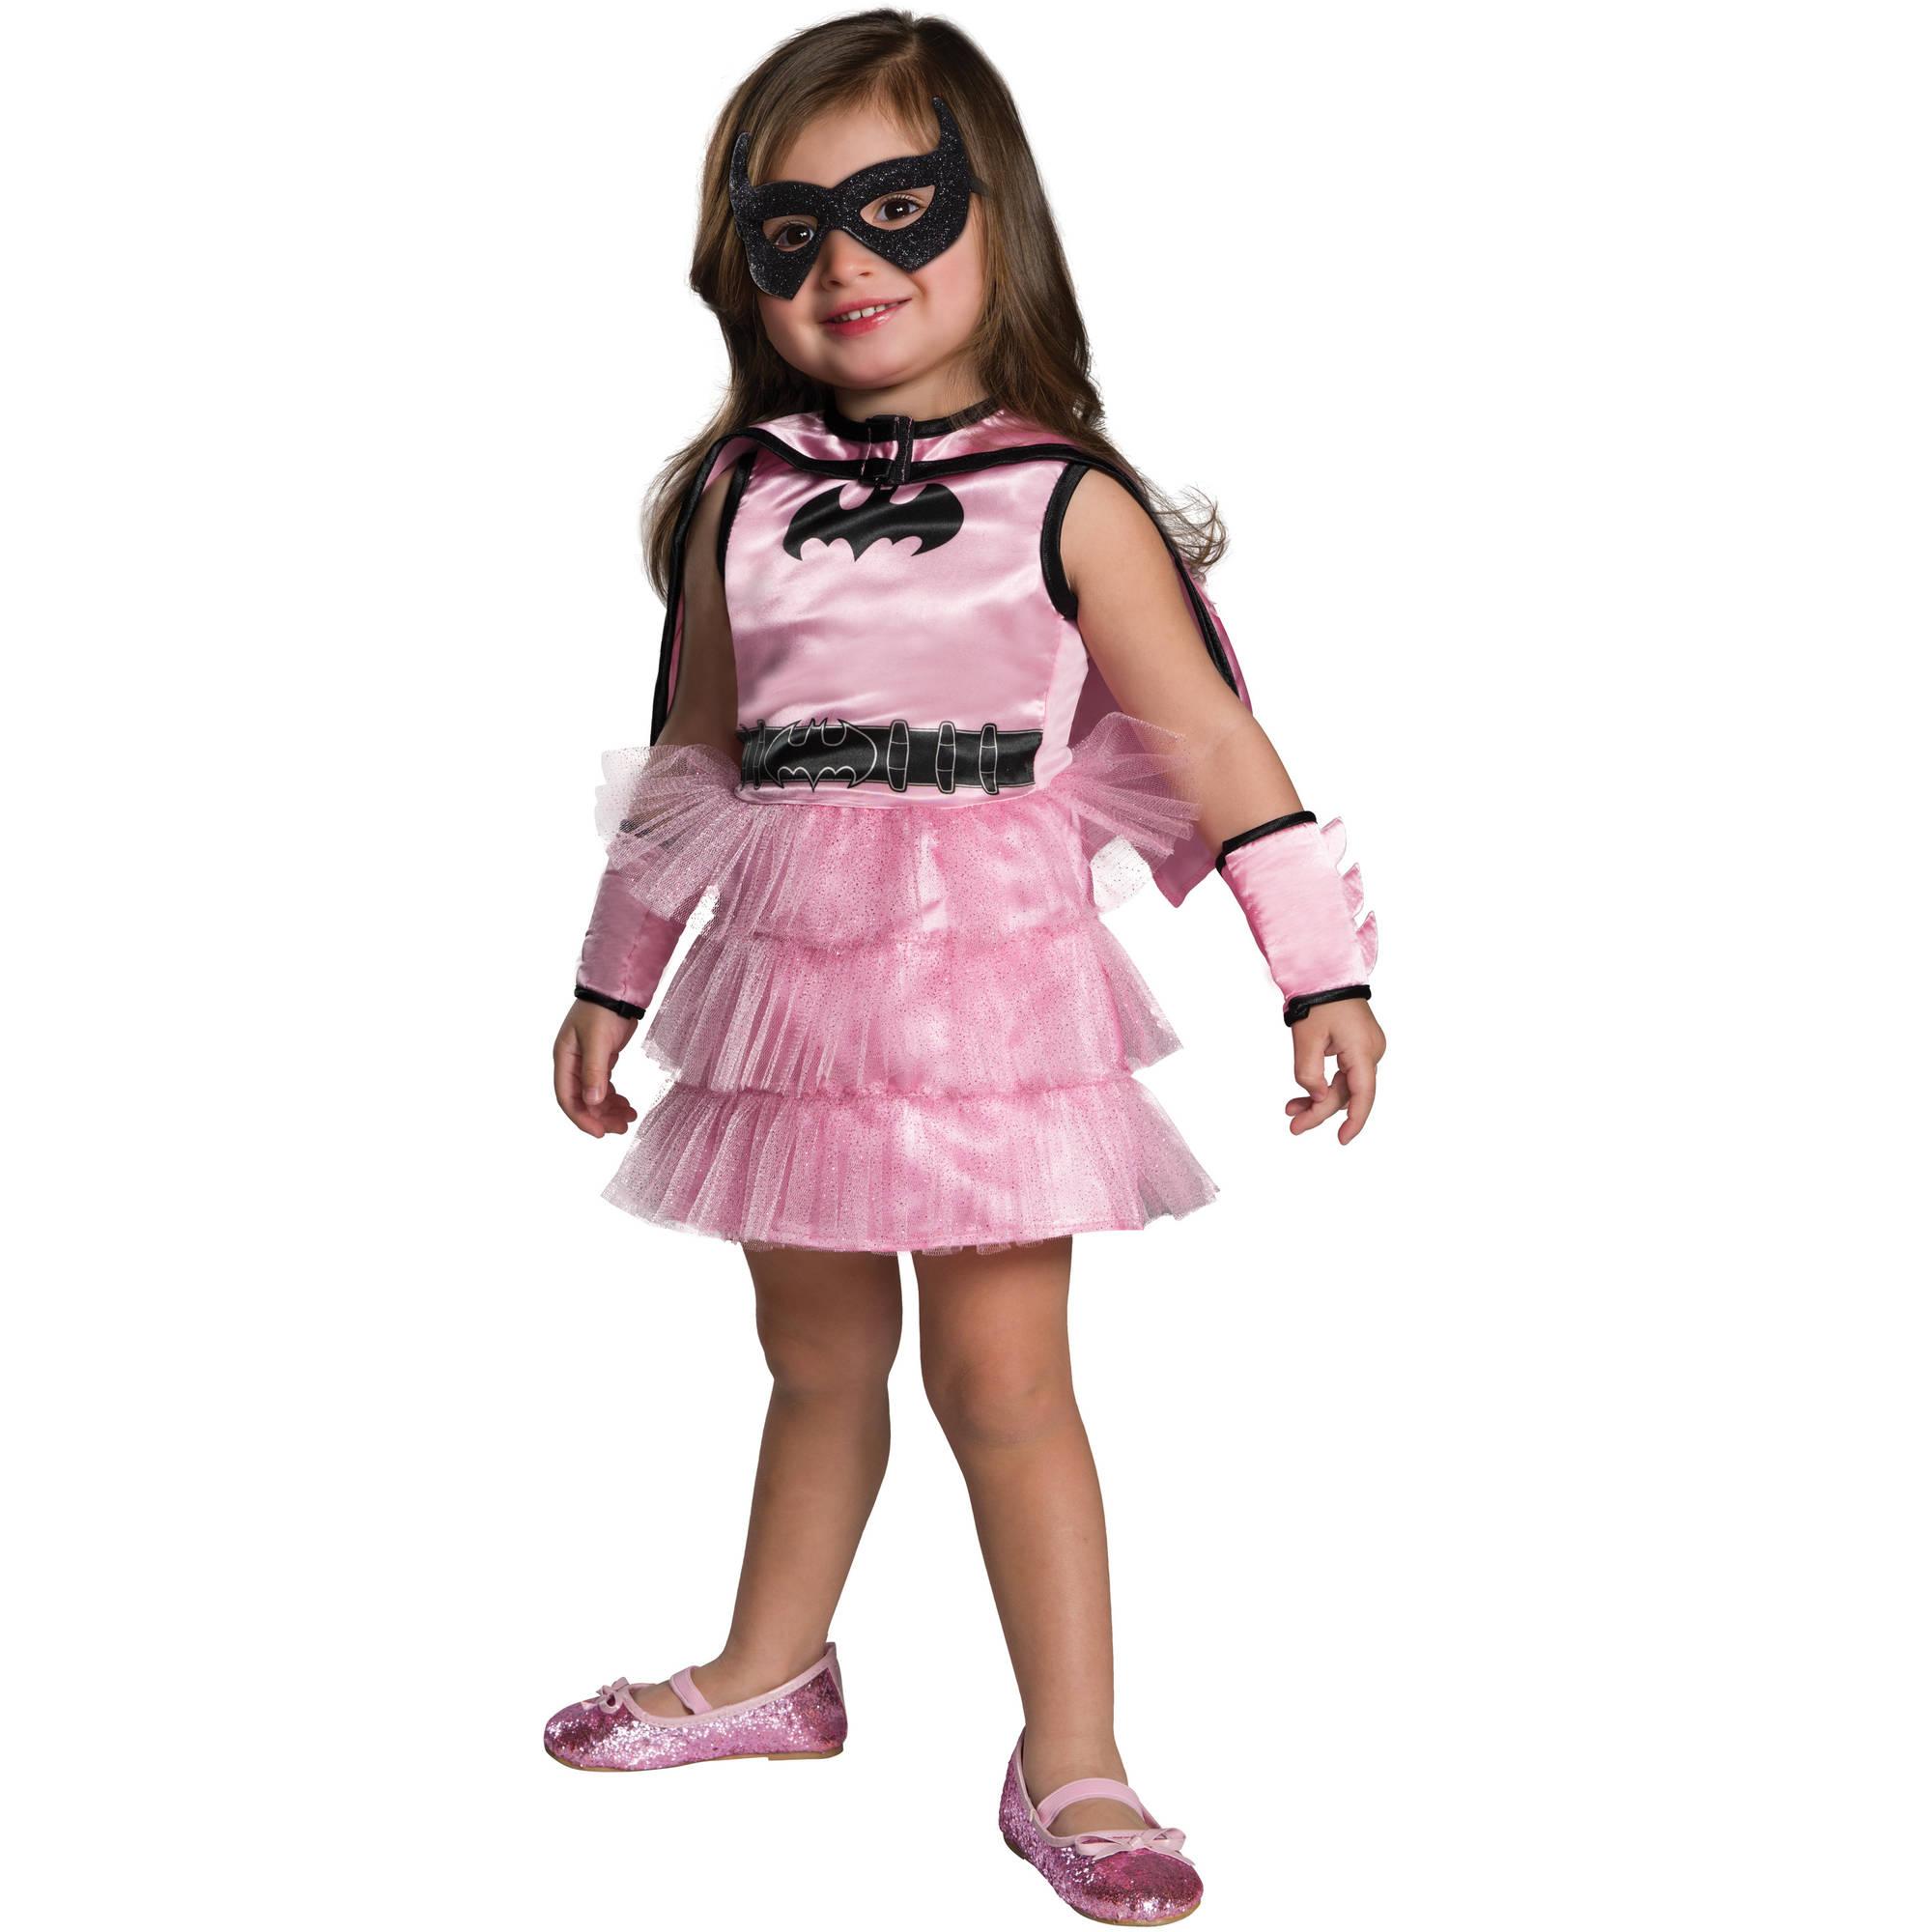 Batgirl Pink and Black Toddler's Costume, 2T